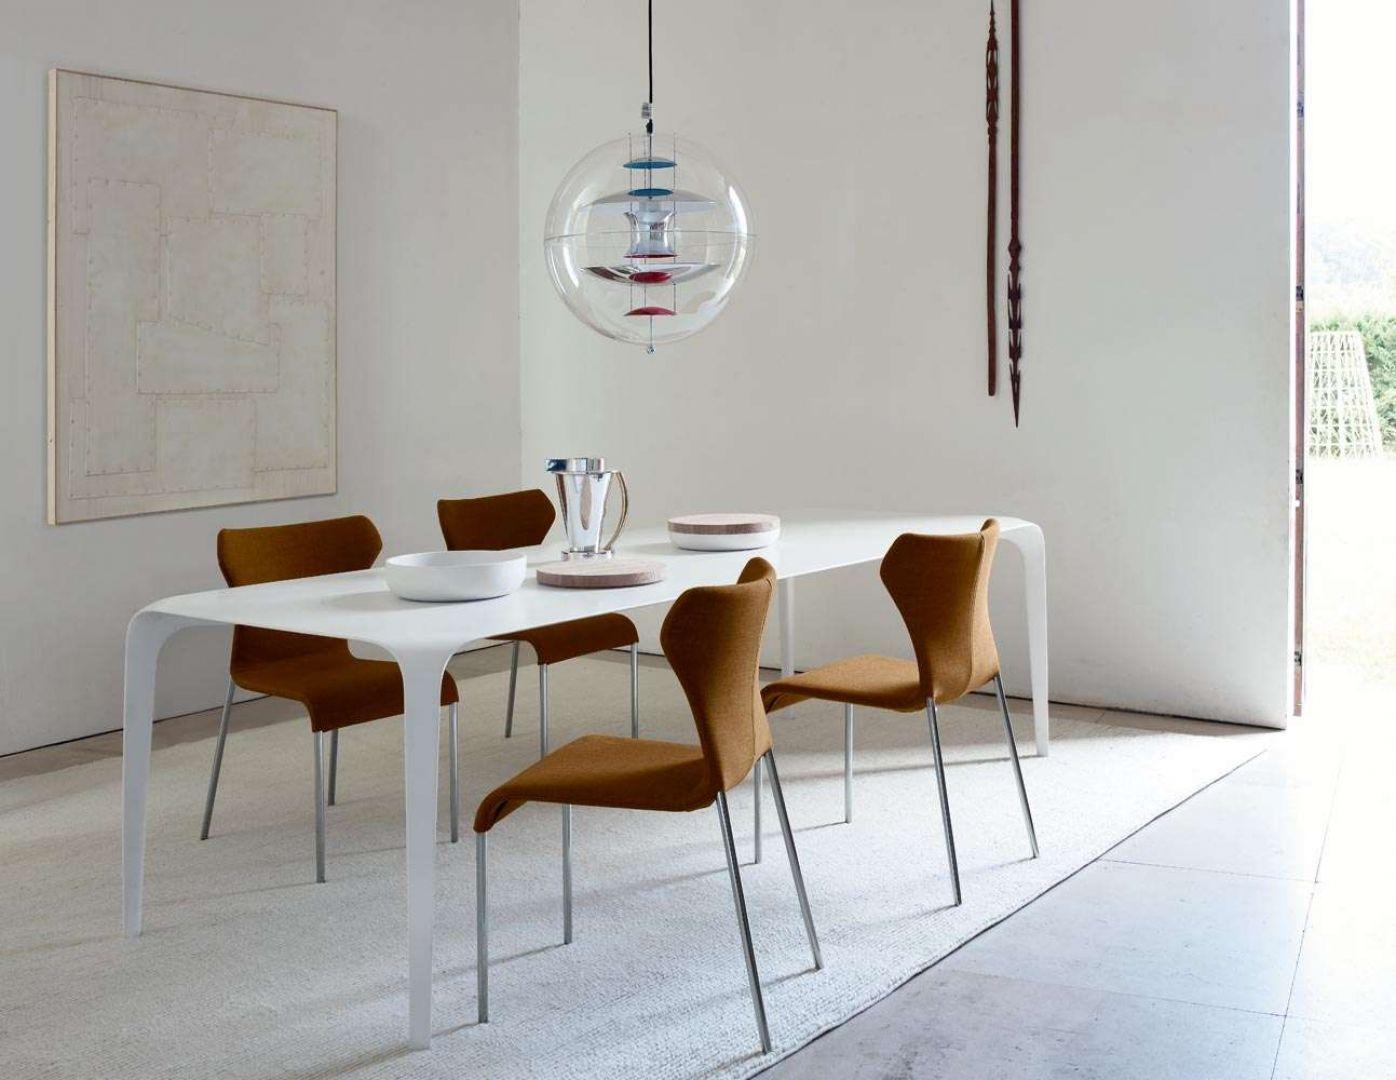 Krzesła z serii Papilio firmy B&B Italia. Projekt: Naoto Fukasawa. Fot. B&B Italia